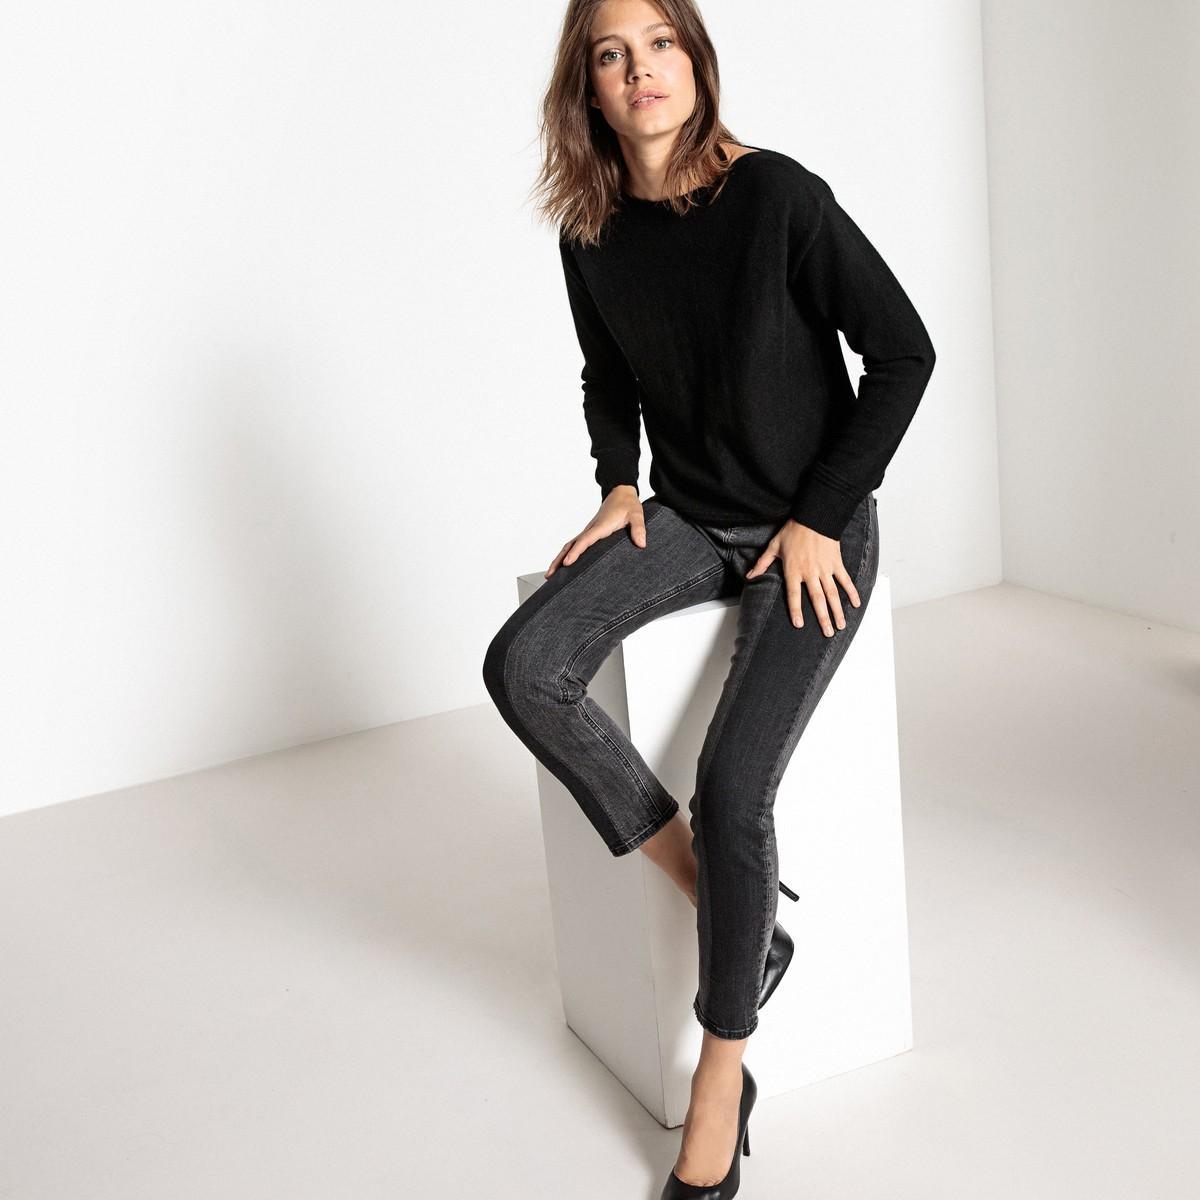 lyst la redoute pull col b teau 100 cachemire in black. Black Bedroom Furniture Sets. Home Design Ideas